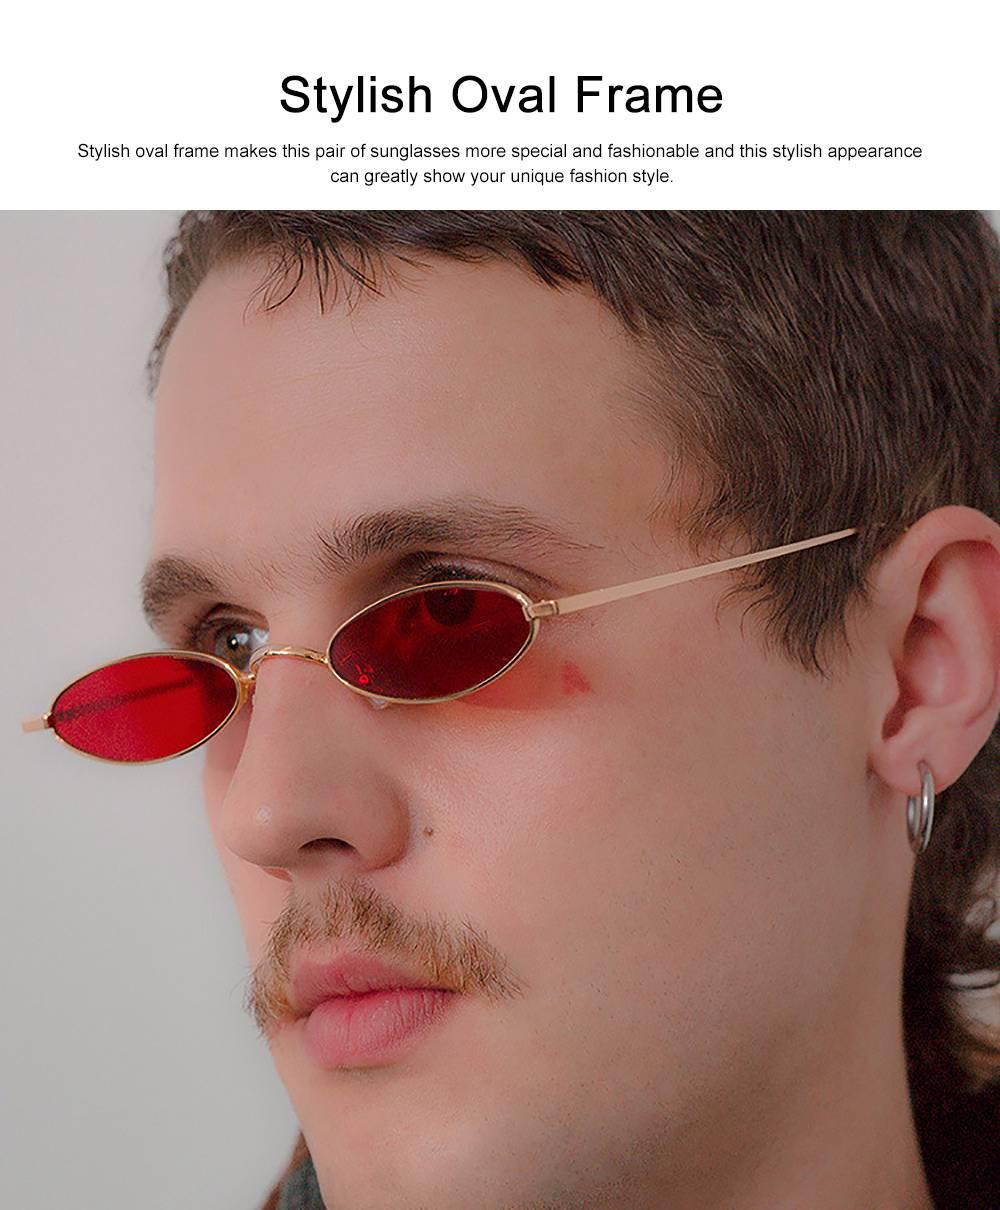 Stylish Individual Oval Model Frame Unisex Sunglasses Sunlight UV Protection Eyeglasses for Women Men 5